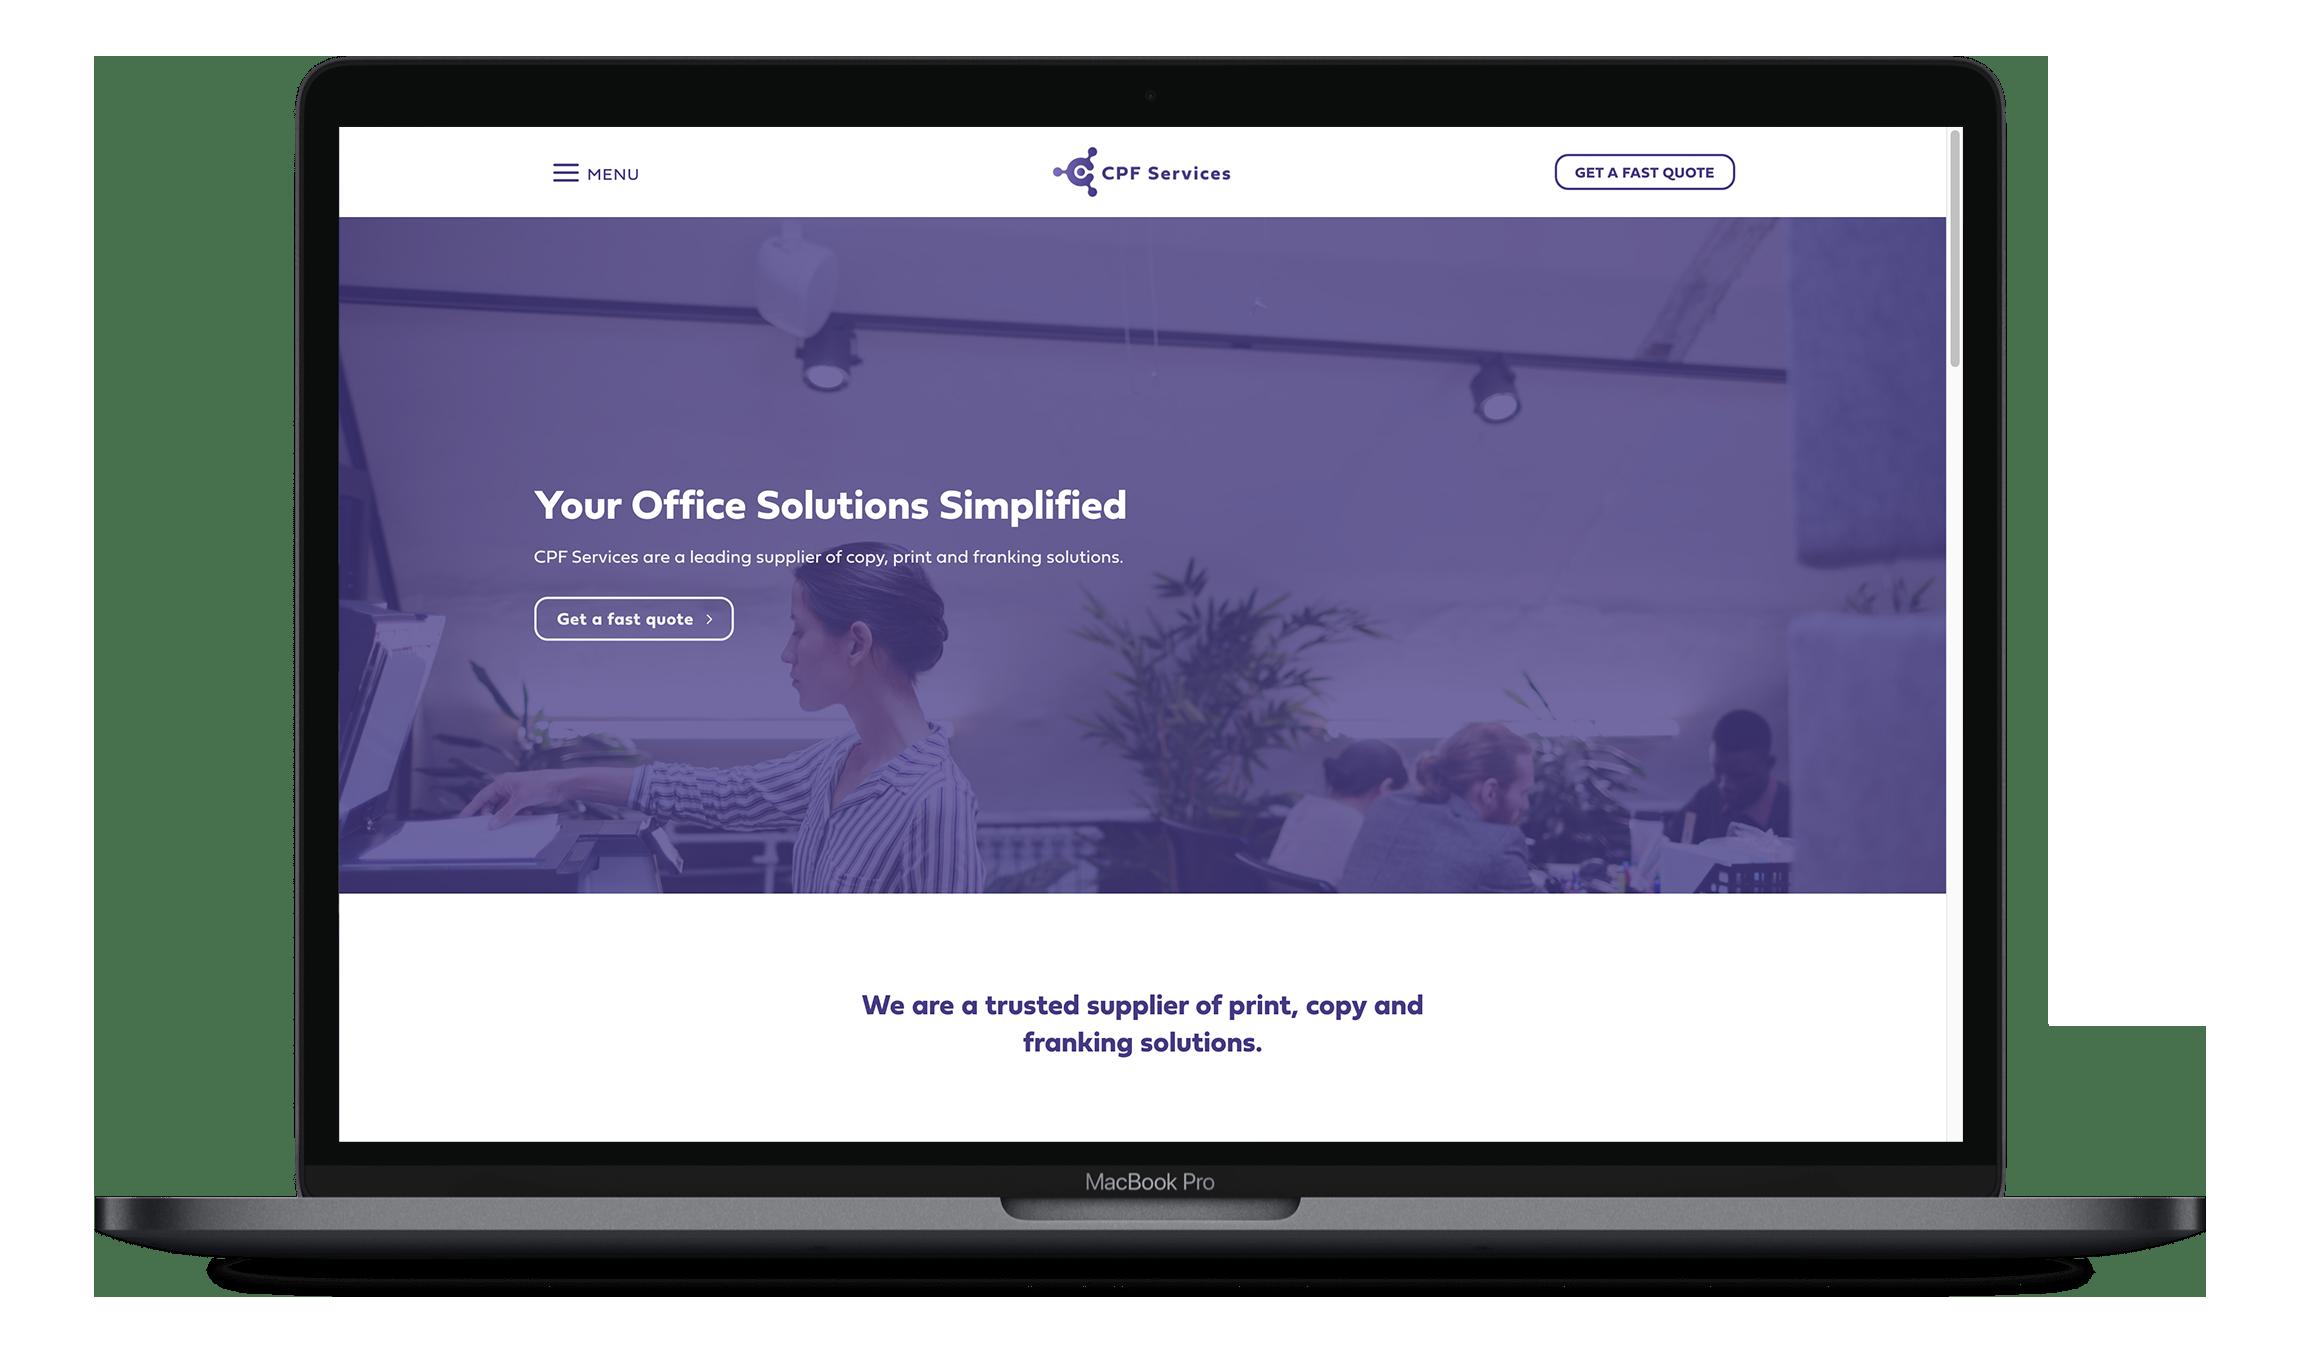 website design ribble valley callit creative mock up 335